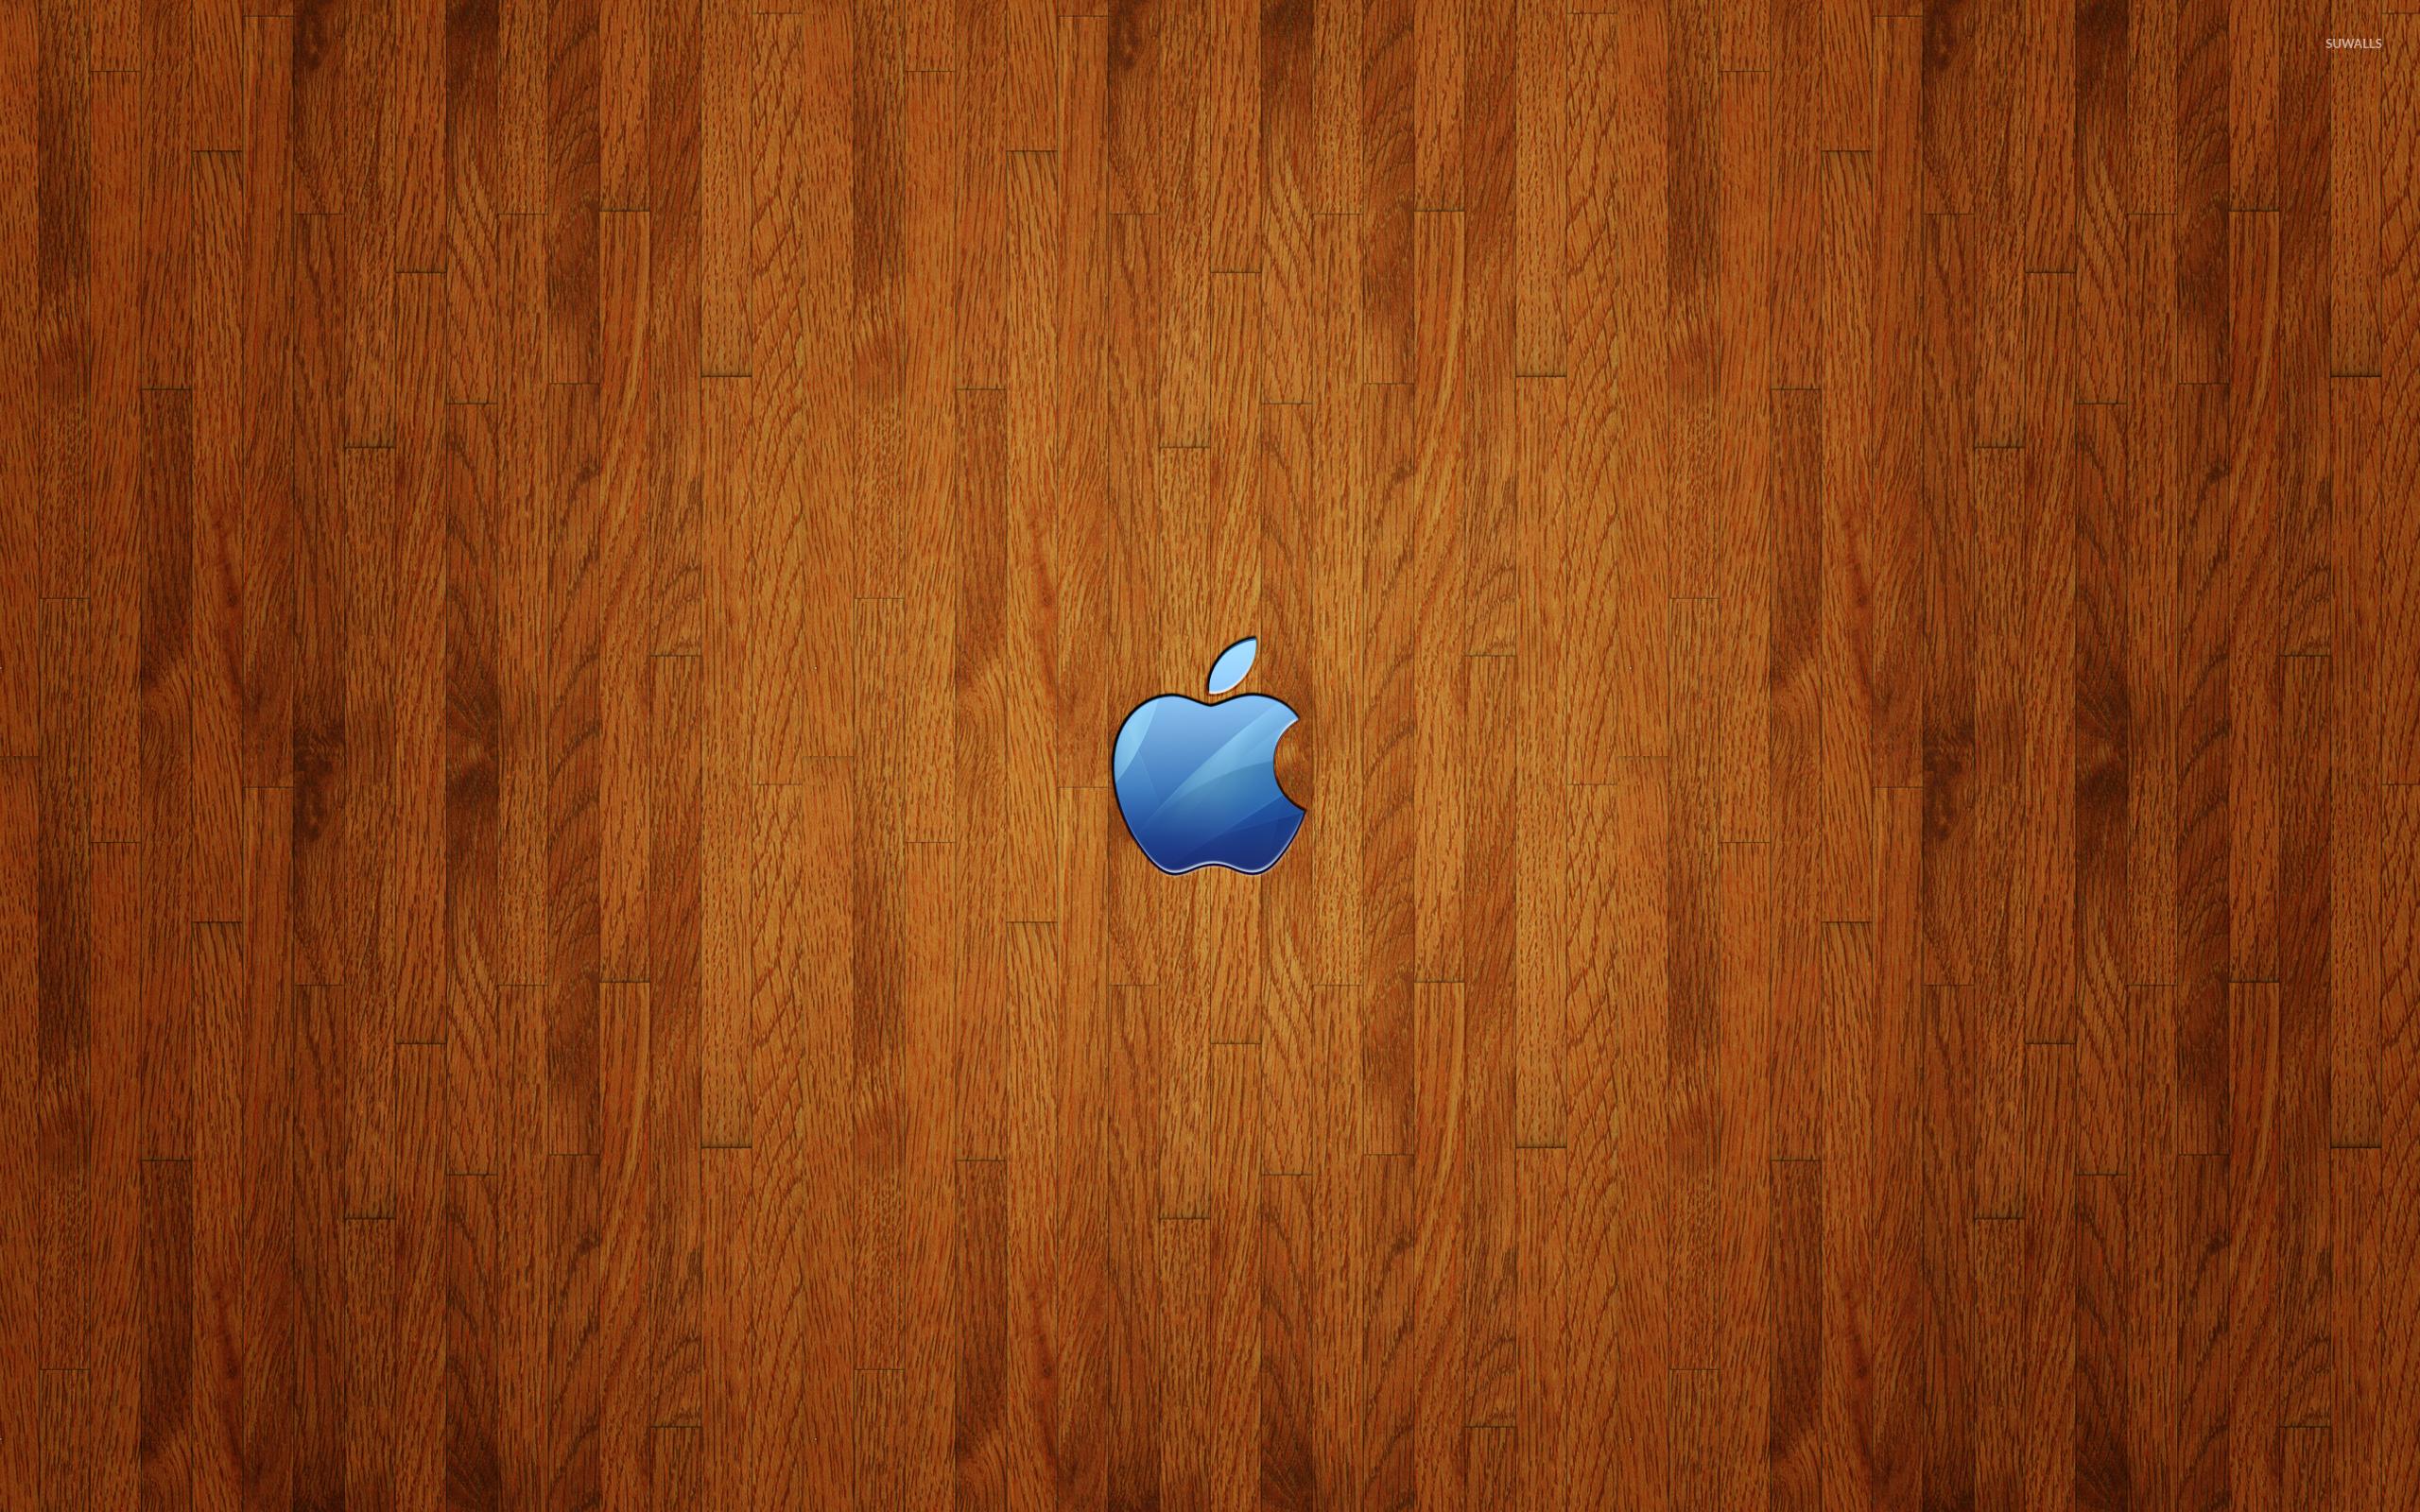 blue apple logo on wood wallpaper - computer wallpapers - #53940